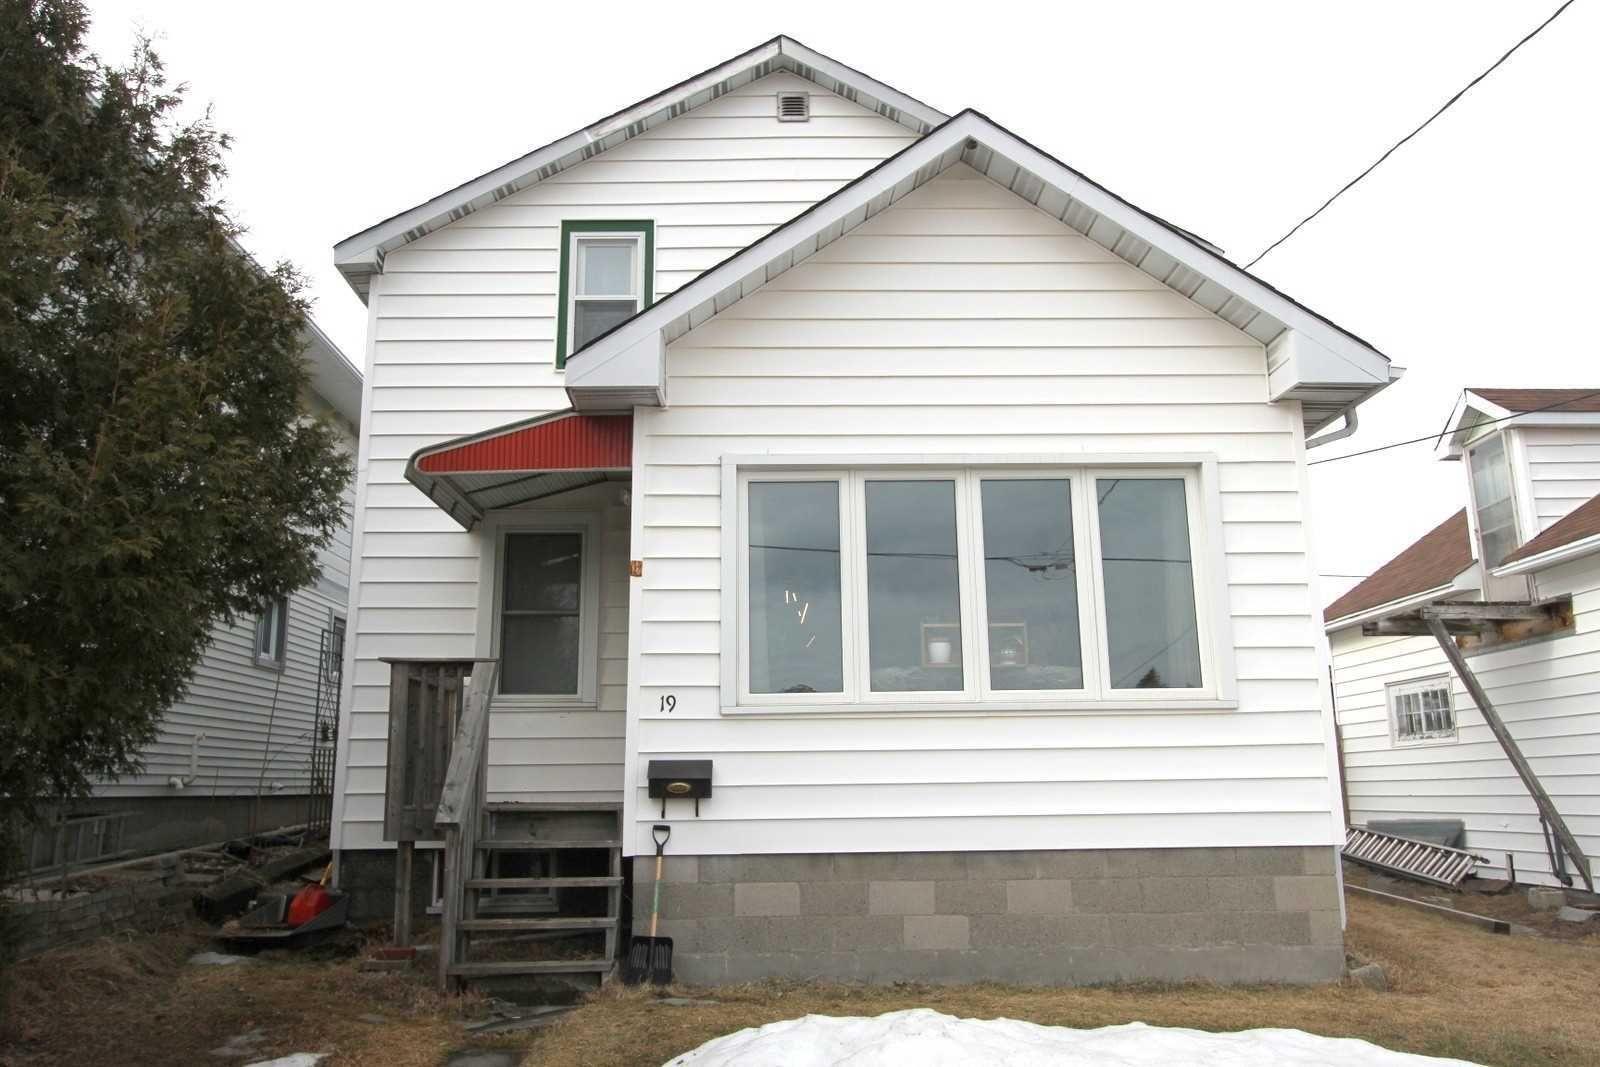 Main Photo: 19 Bulmer Avenue in Greater Sudbury: Sudbury House (2-Storey) for sale : MLS®# X5171129